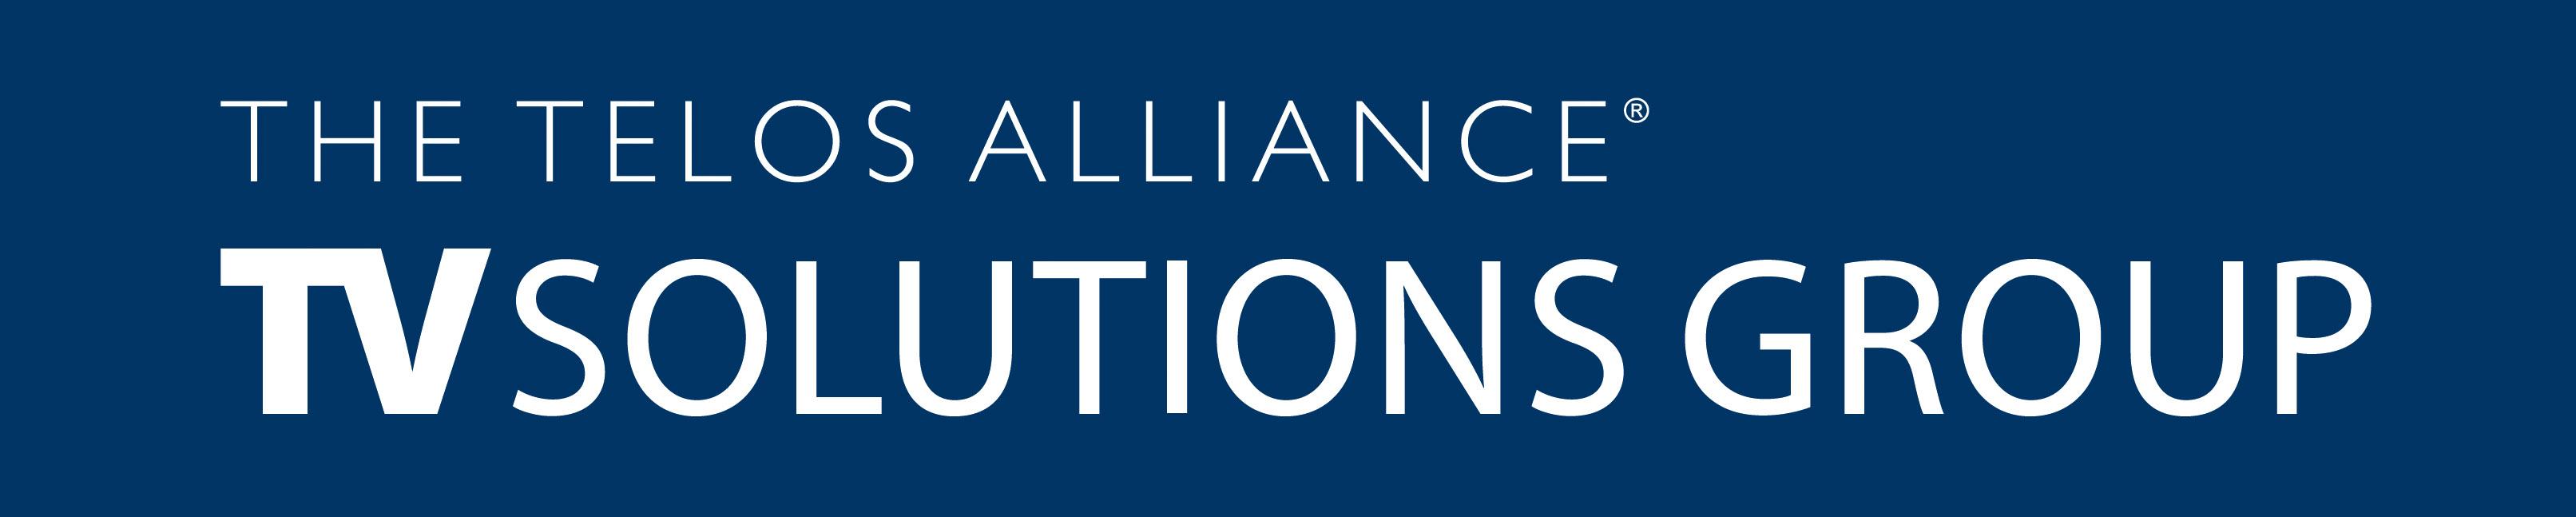 Telos Alliance TV Solutions Group